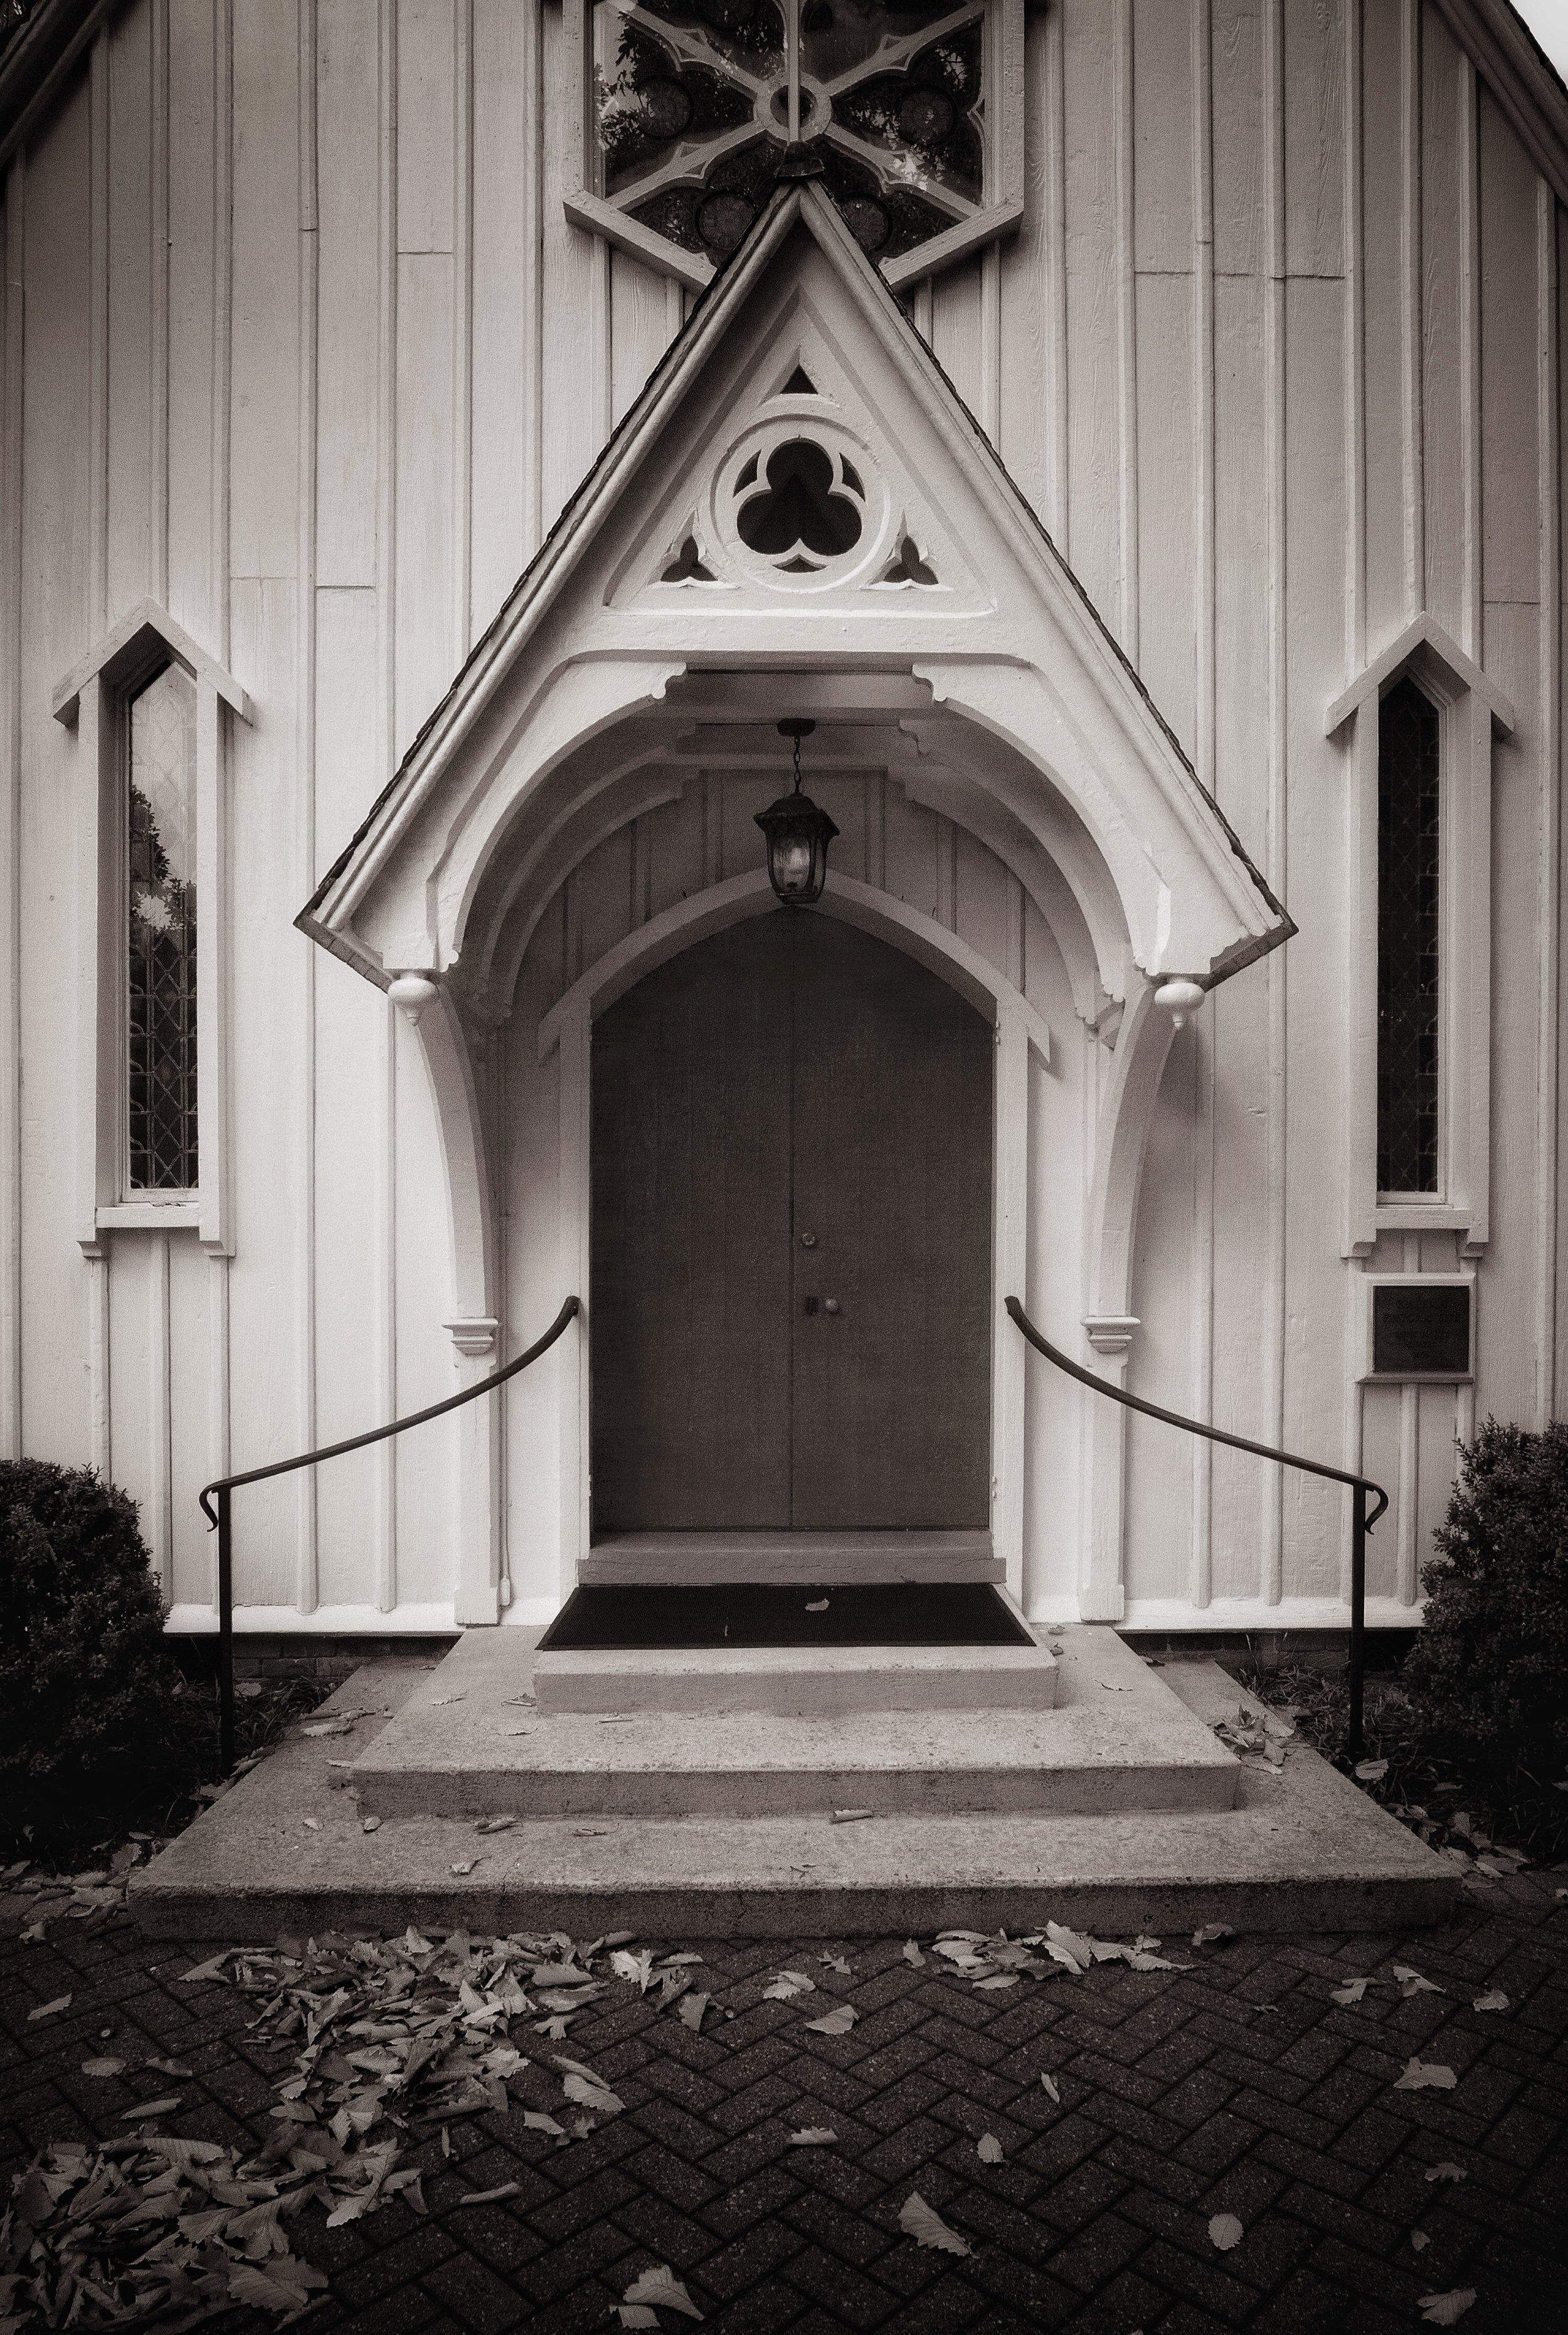 Wonderful carpenter Gothic Design by Richard Upjohn.